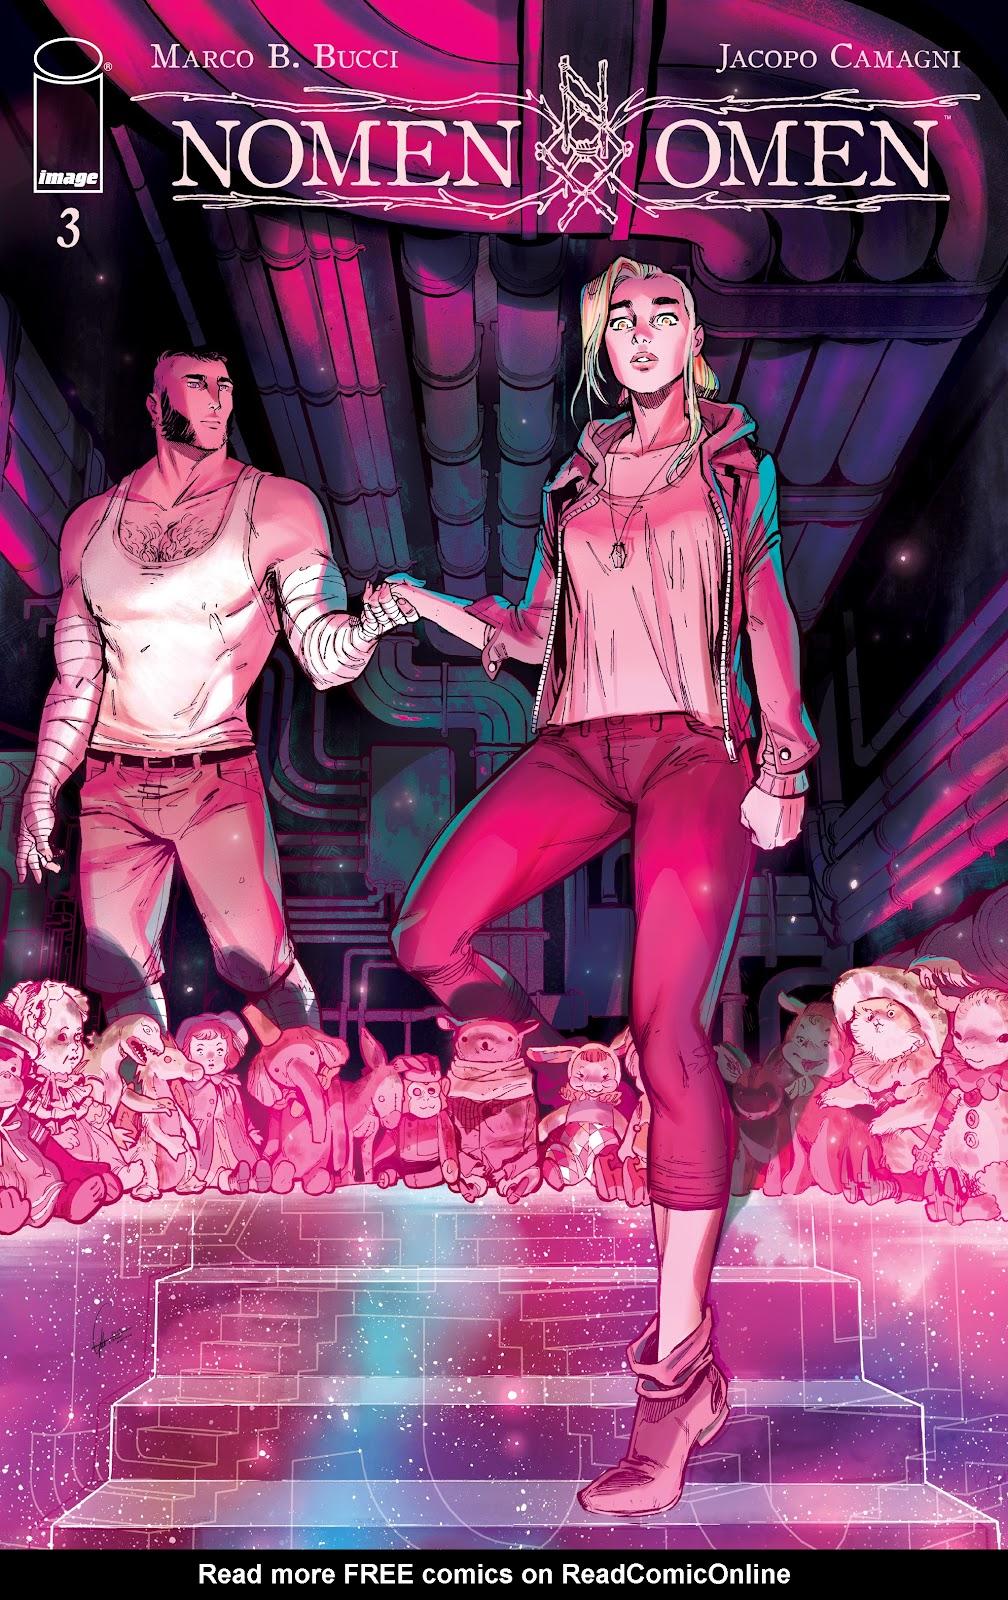 Read online Nomen Omen comic -  Issue #3 - 1